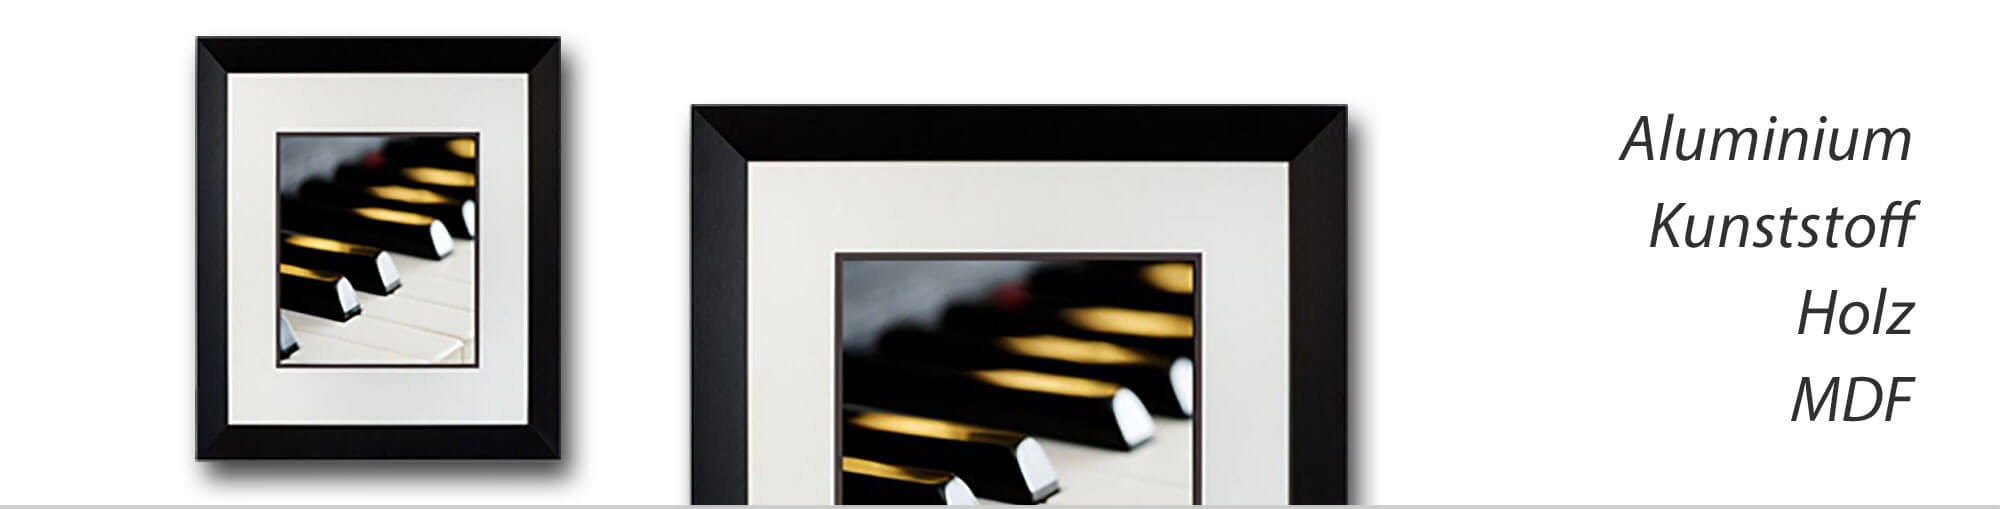 bilderrahmen 15x21 cm din a5 aus der kategorie bilderrahmen. Black Bedroom Furniture Sets. Home Design Ideas